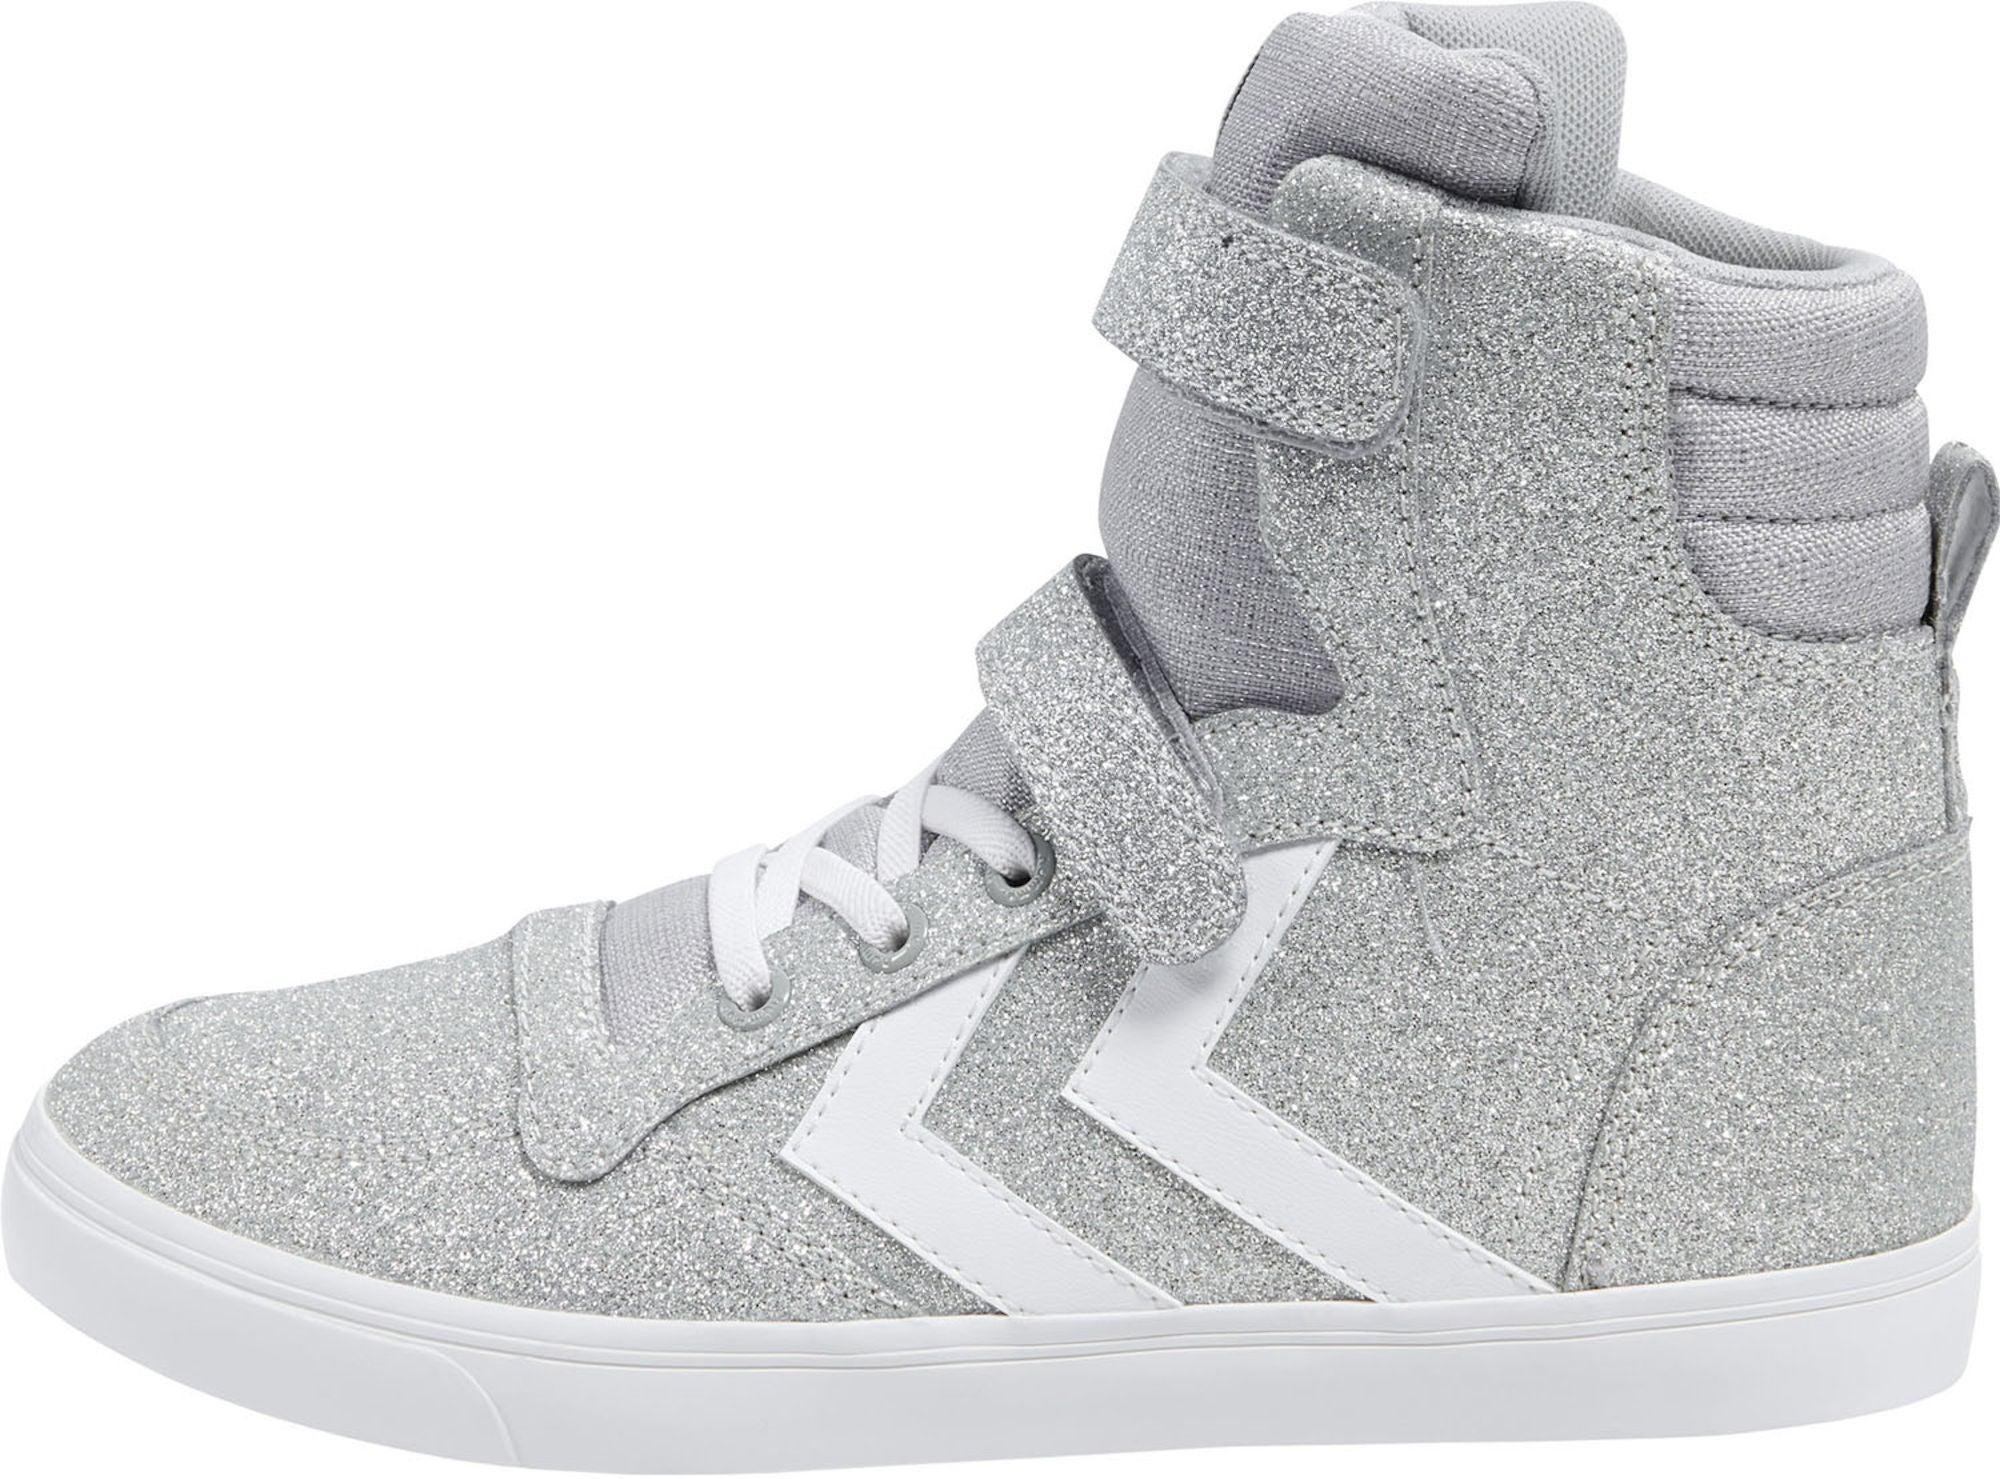 szalona cena najlepszy wybór gorące produkty SneakersSilverJollyroom Jr Hummel Slimmer Stadil High Køb ...